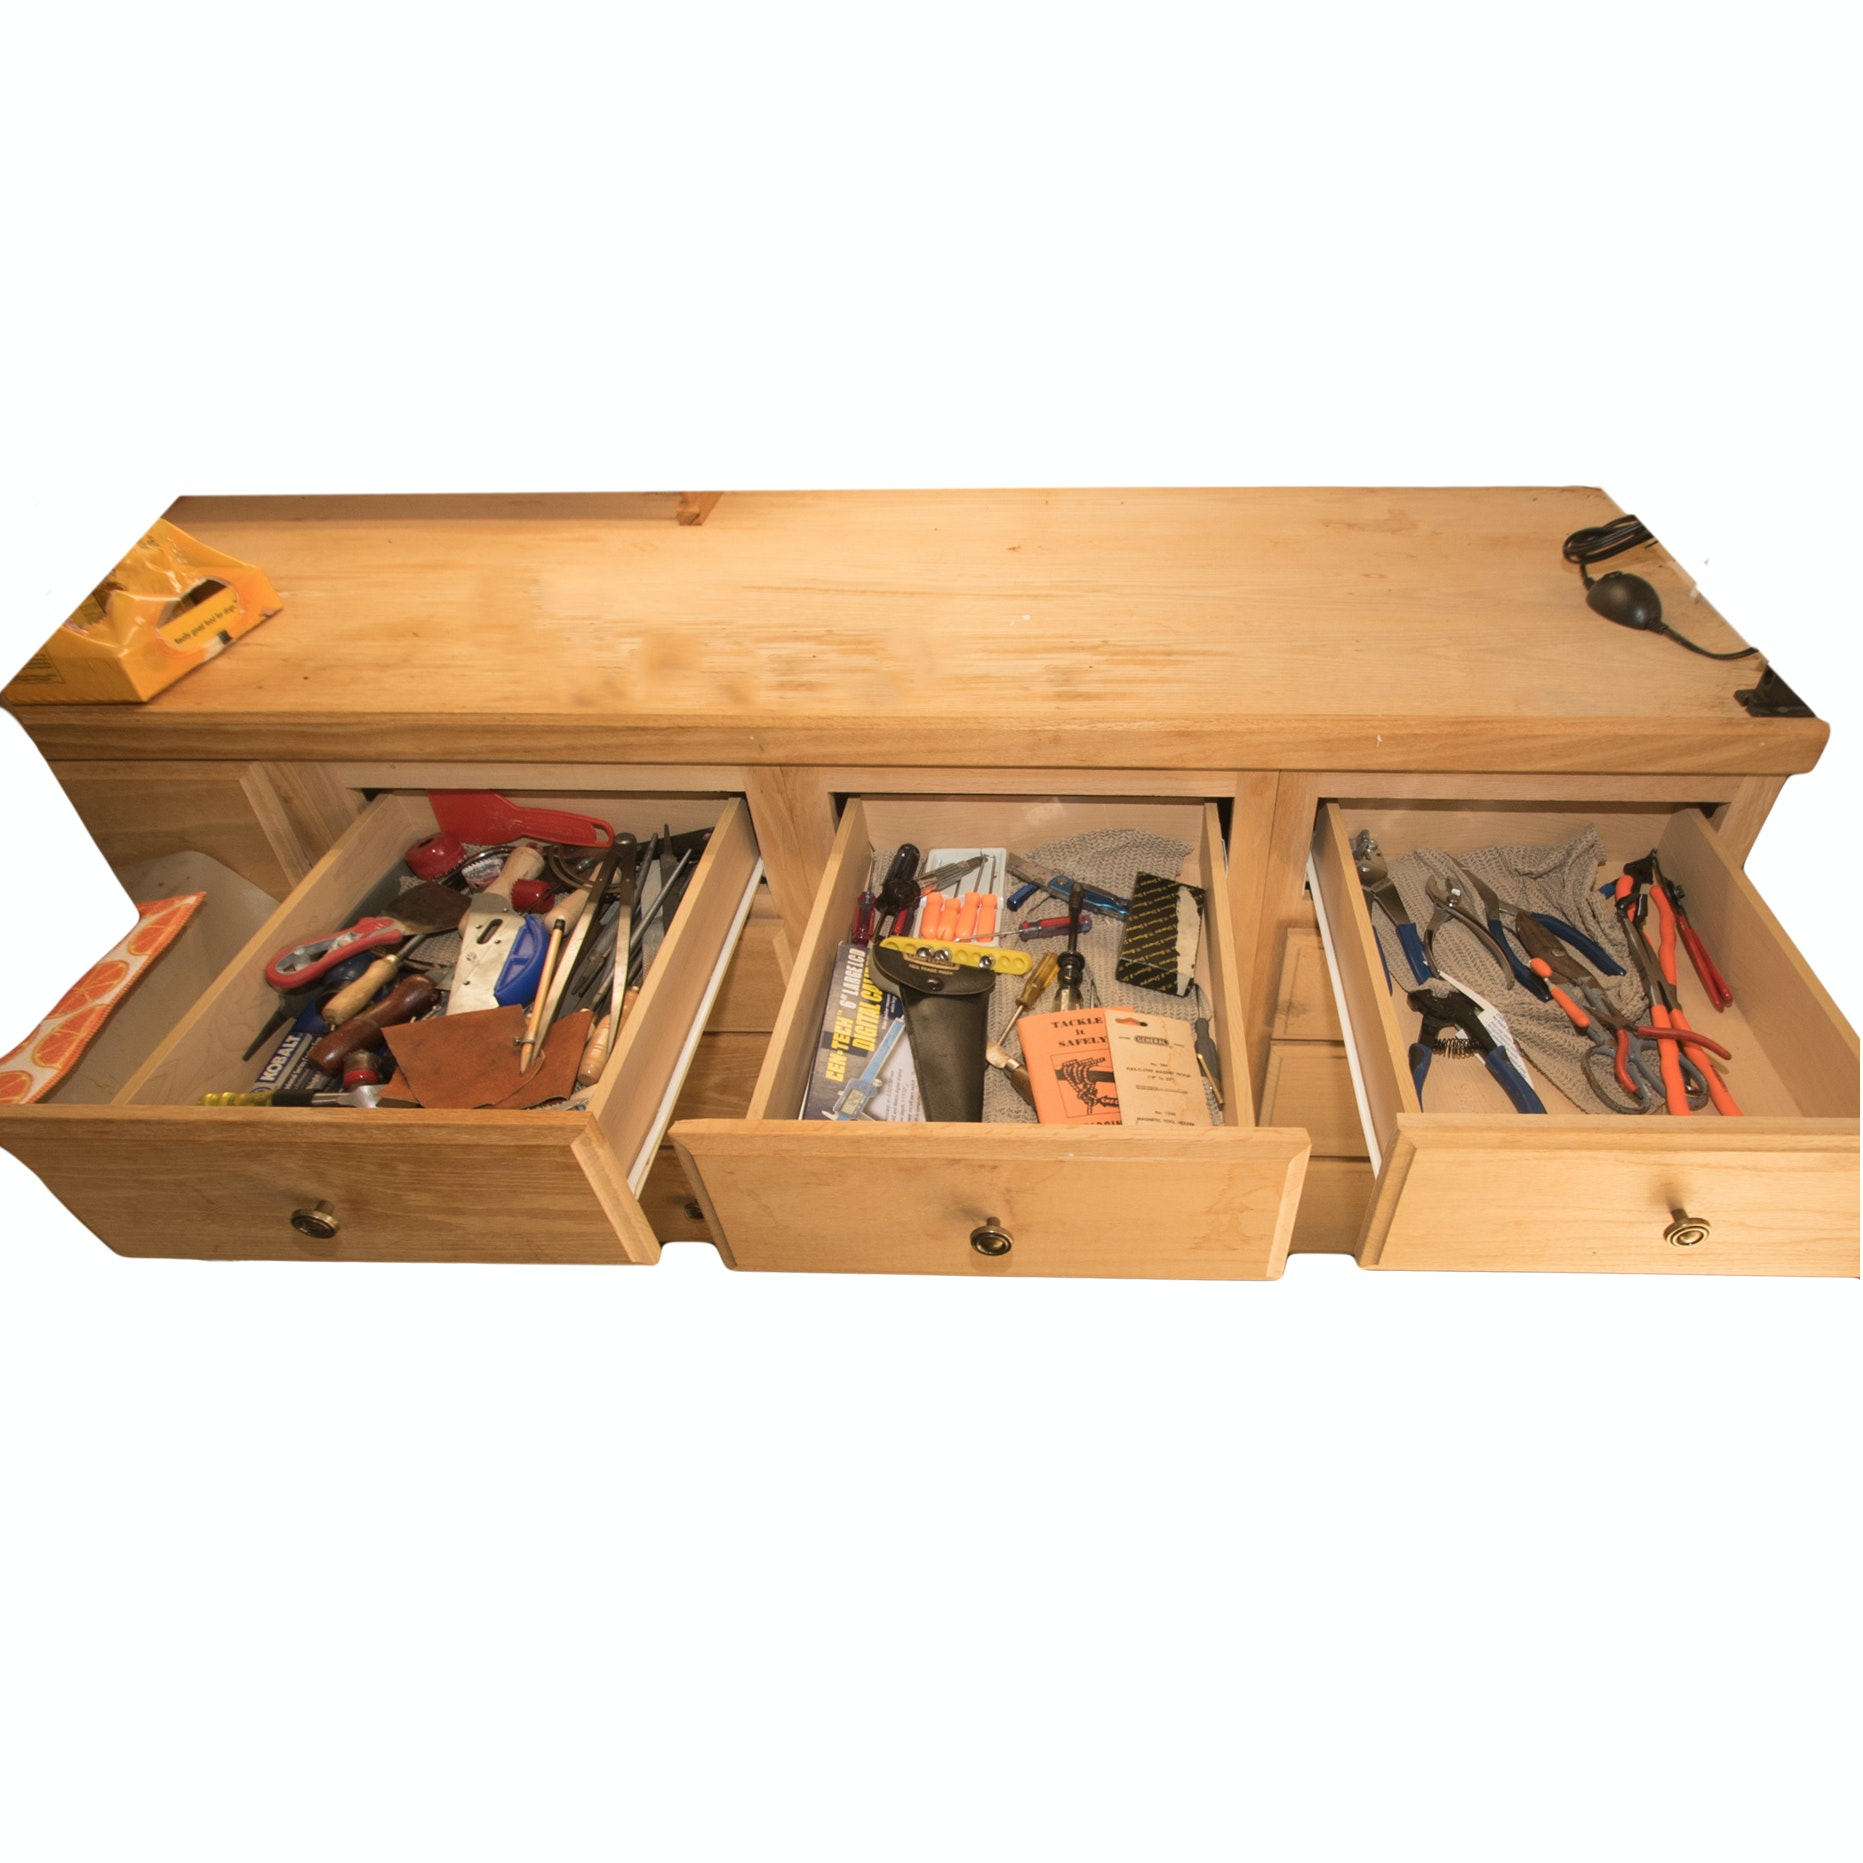 Generous Assortment of Tools